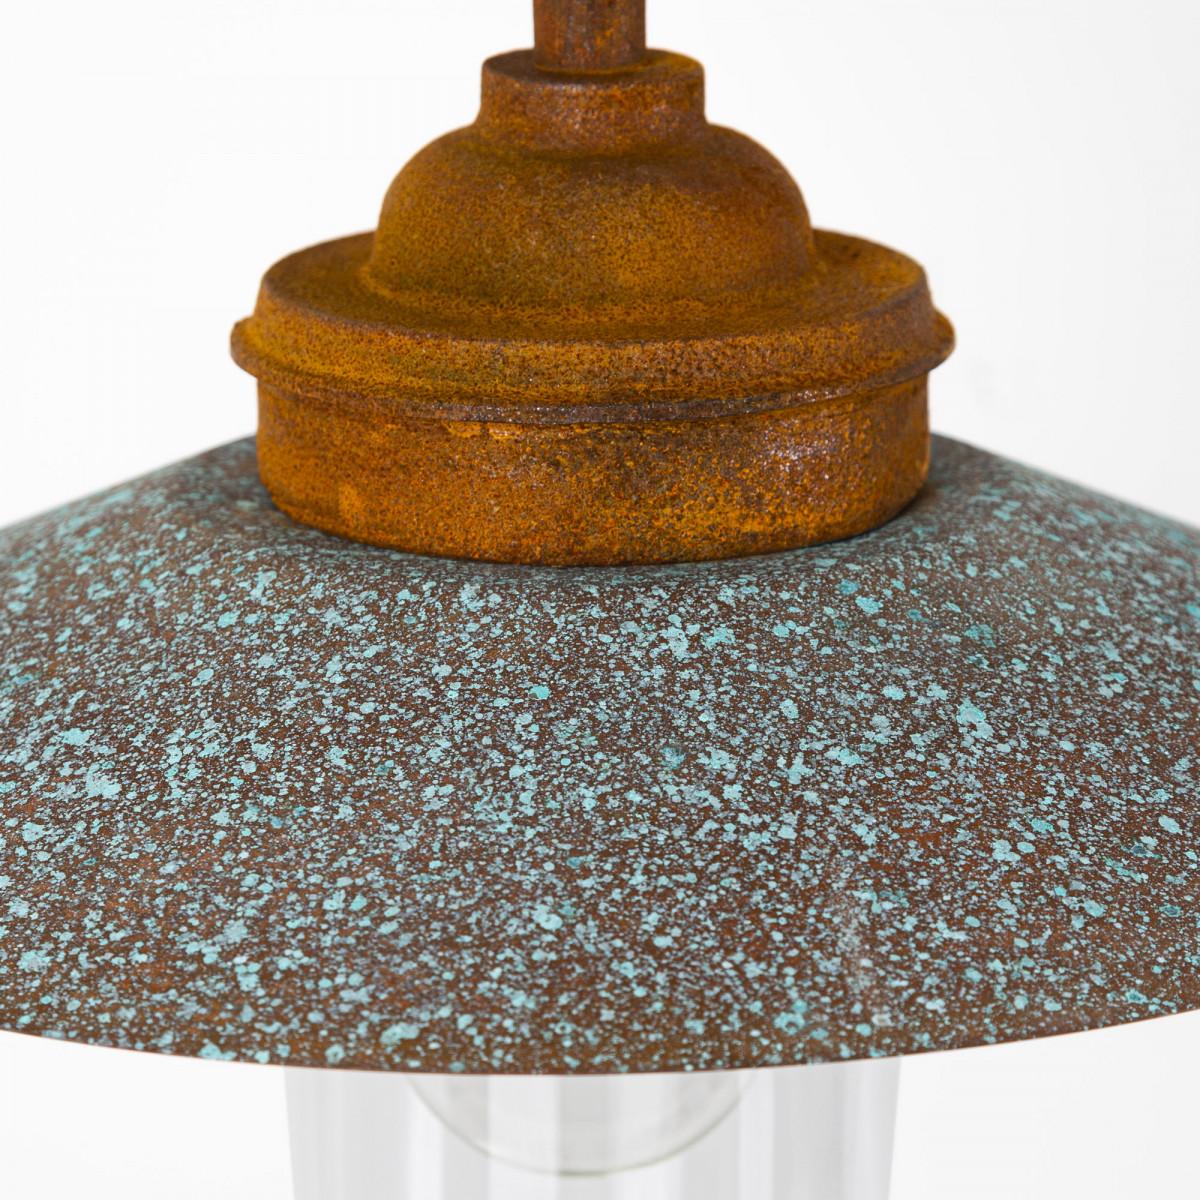 Stallamp Ardennes Roest gietijzer koper landelijke buitenverlichting, franse stallamp van KS Verlichting